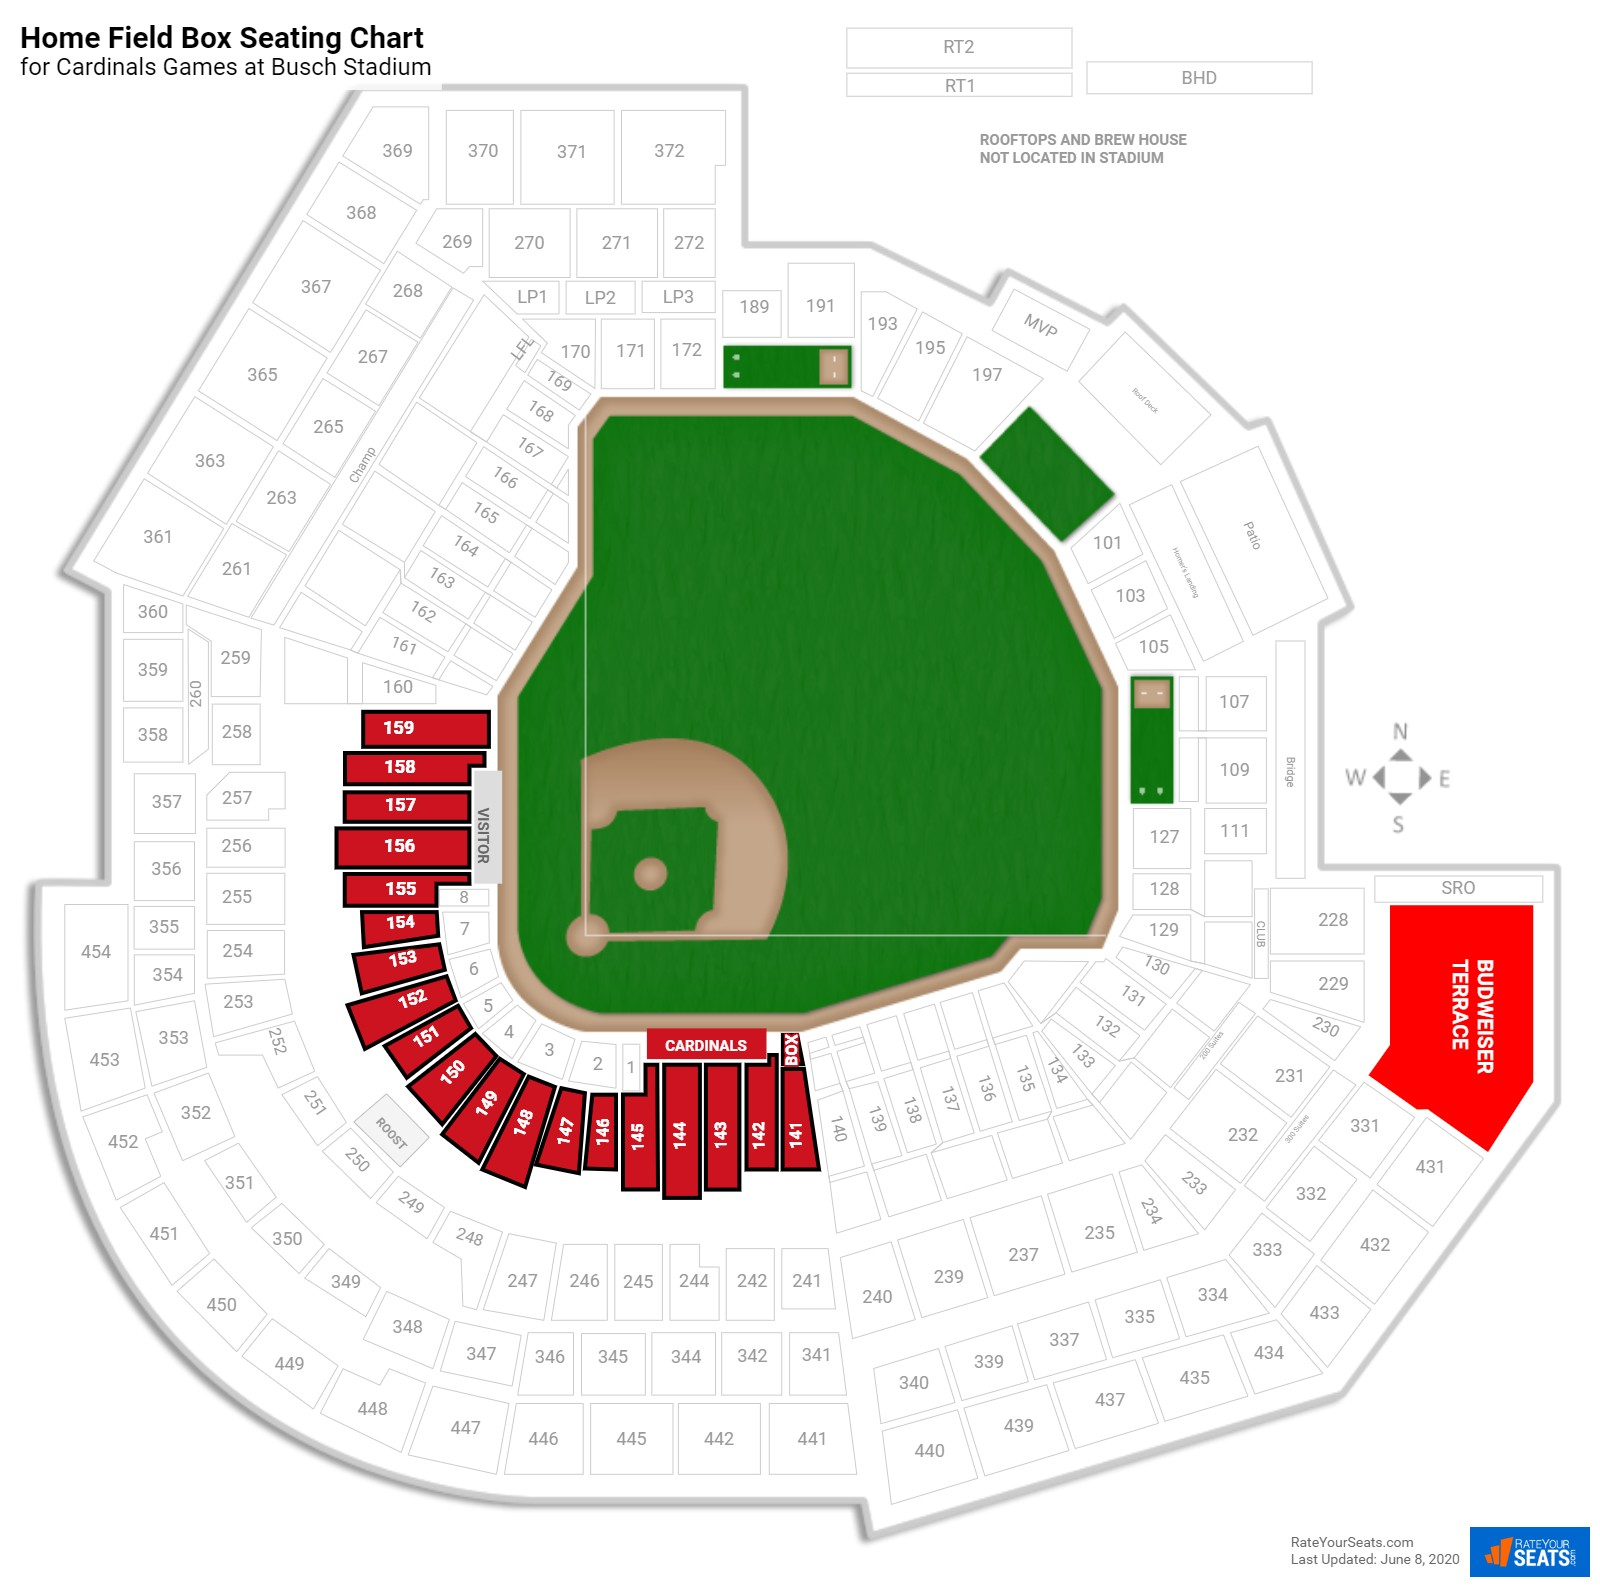 Busch Stadium Home Field Box Baseball Seating